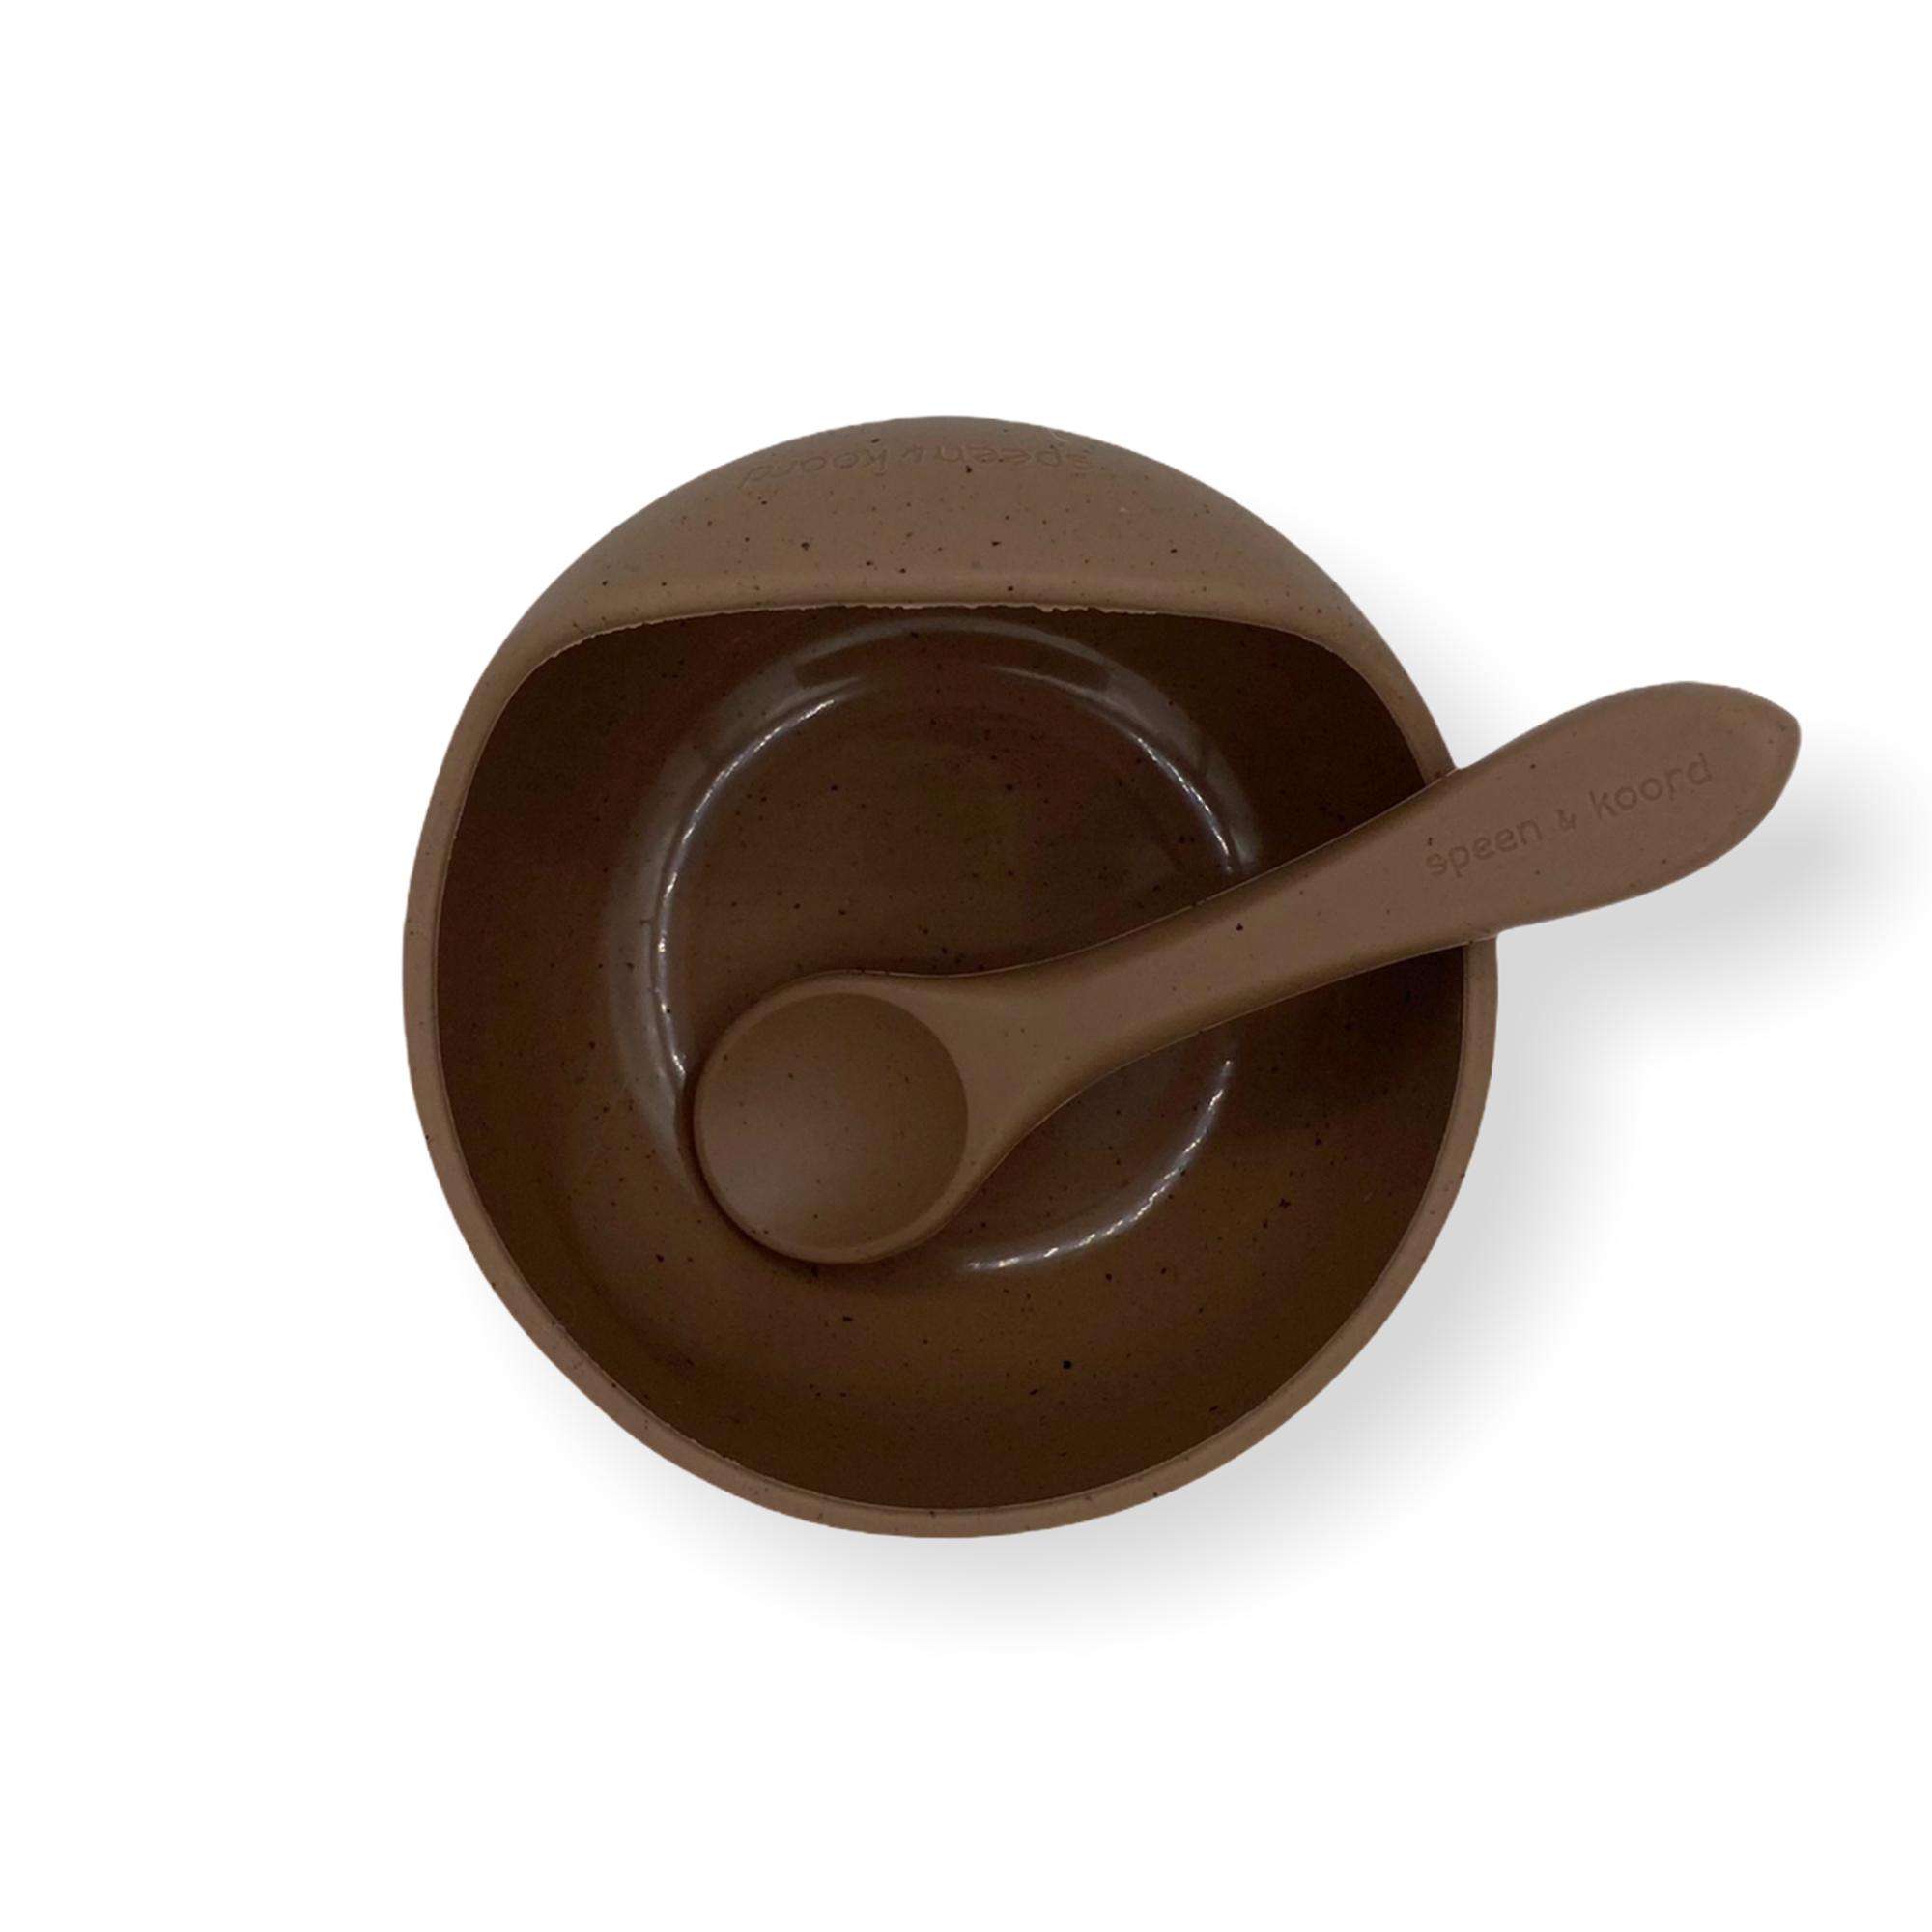 Afbeelding Speen & Koord Silicone kom + lepel I Speckled Coffee